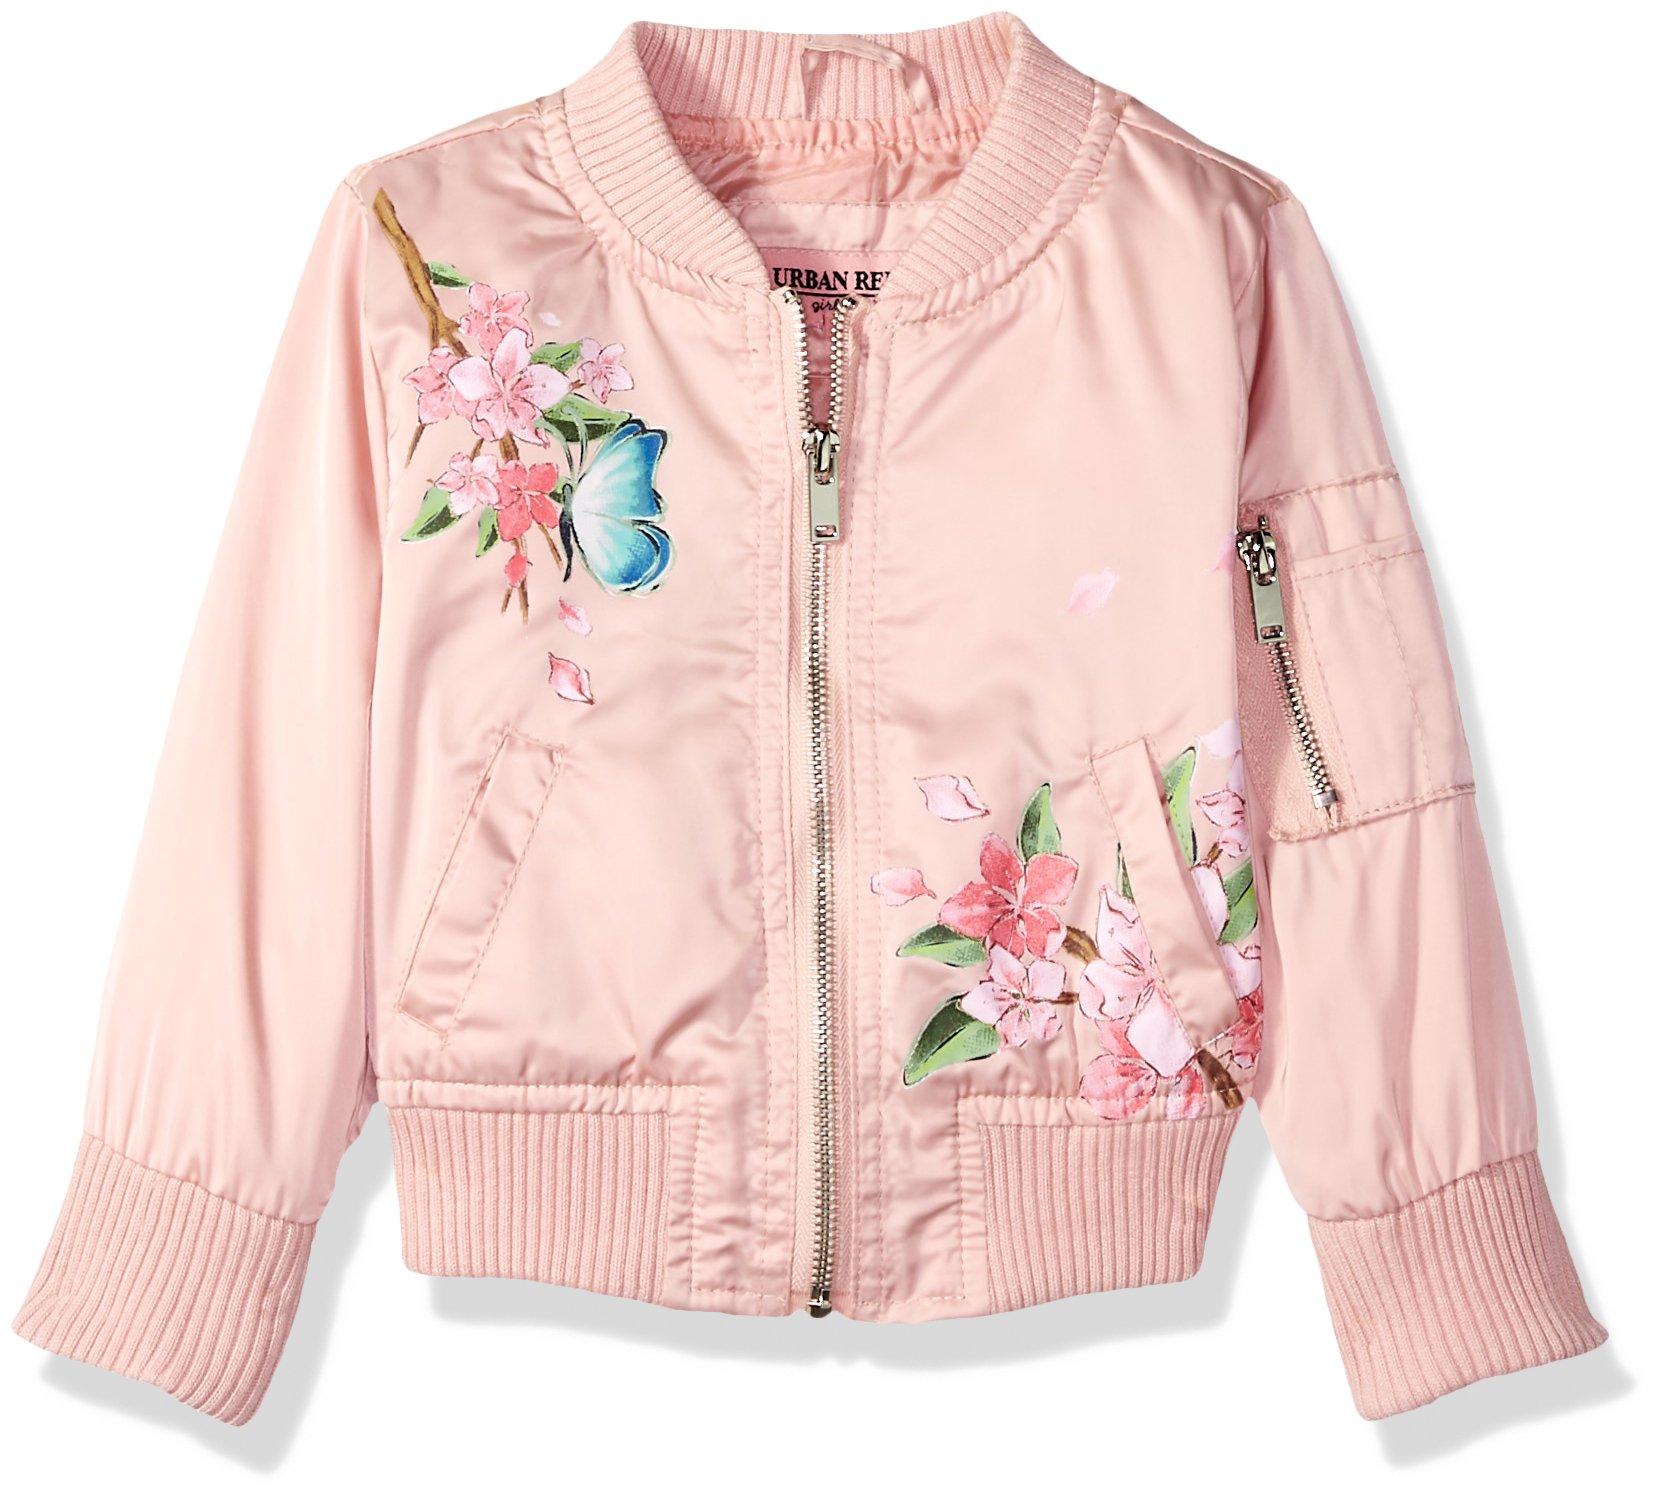 Urban Republic Little Girls' Poly-Sateen Jacket, Pink, 5/6